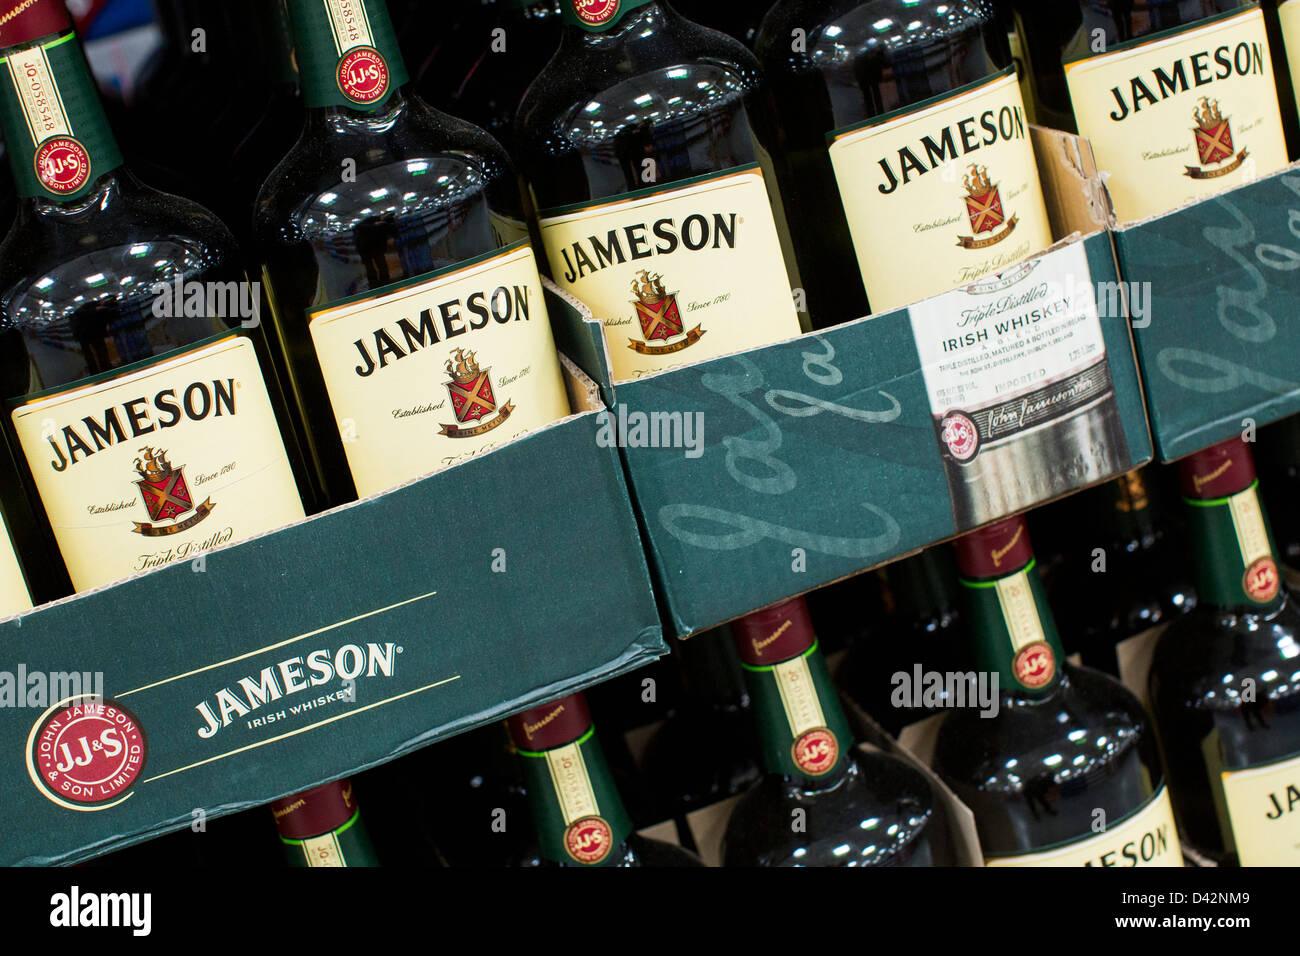 Jameson Whiskey Bottle Stock Photos & Jameson Whiskey Bottle